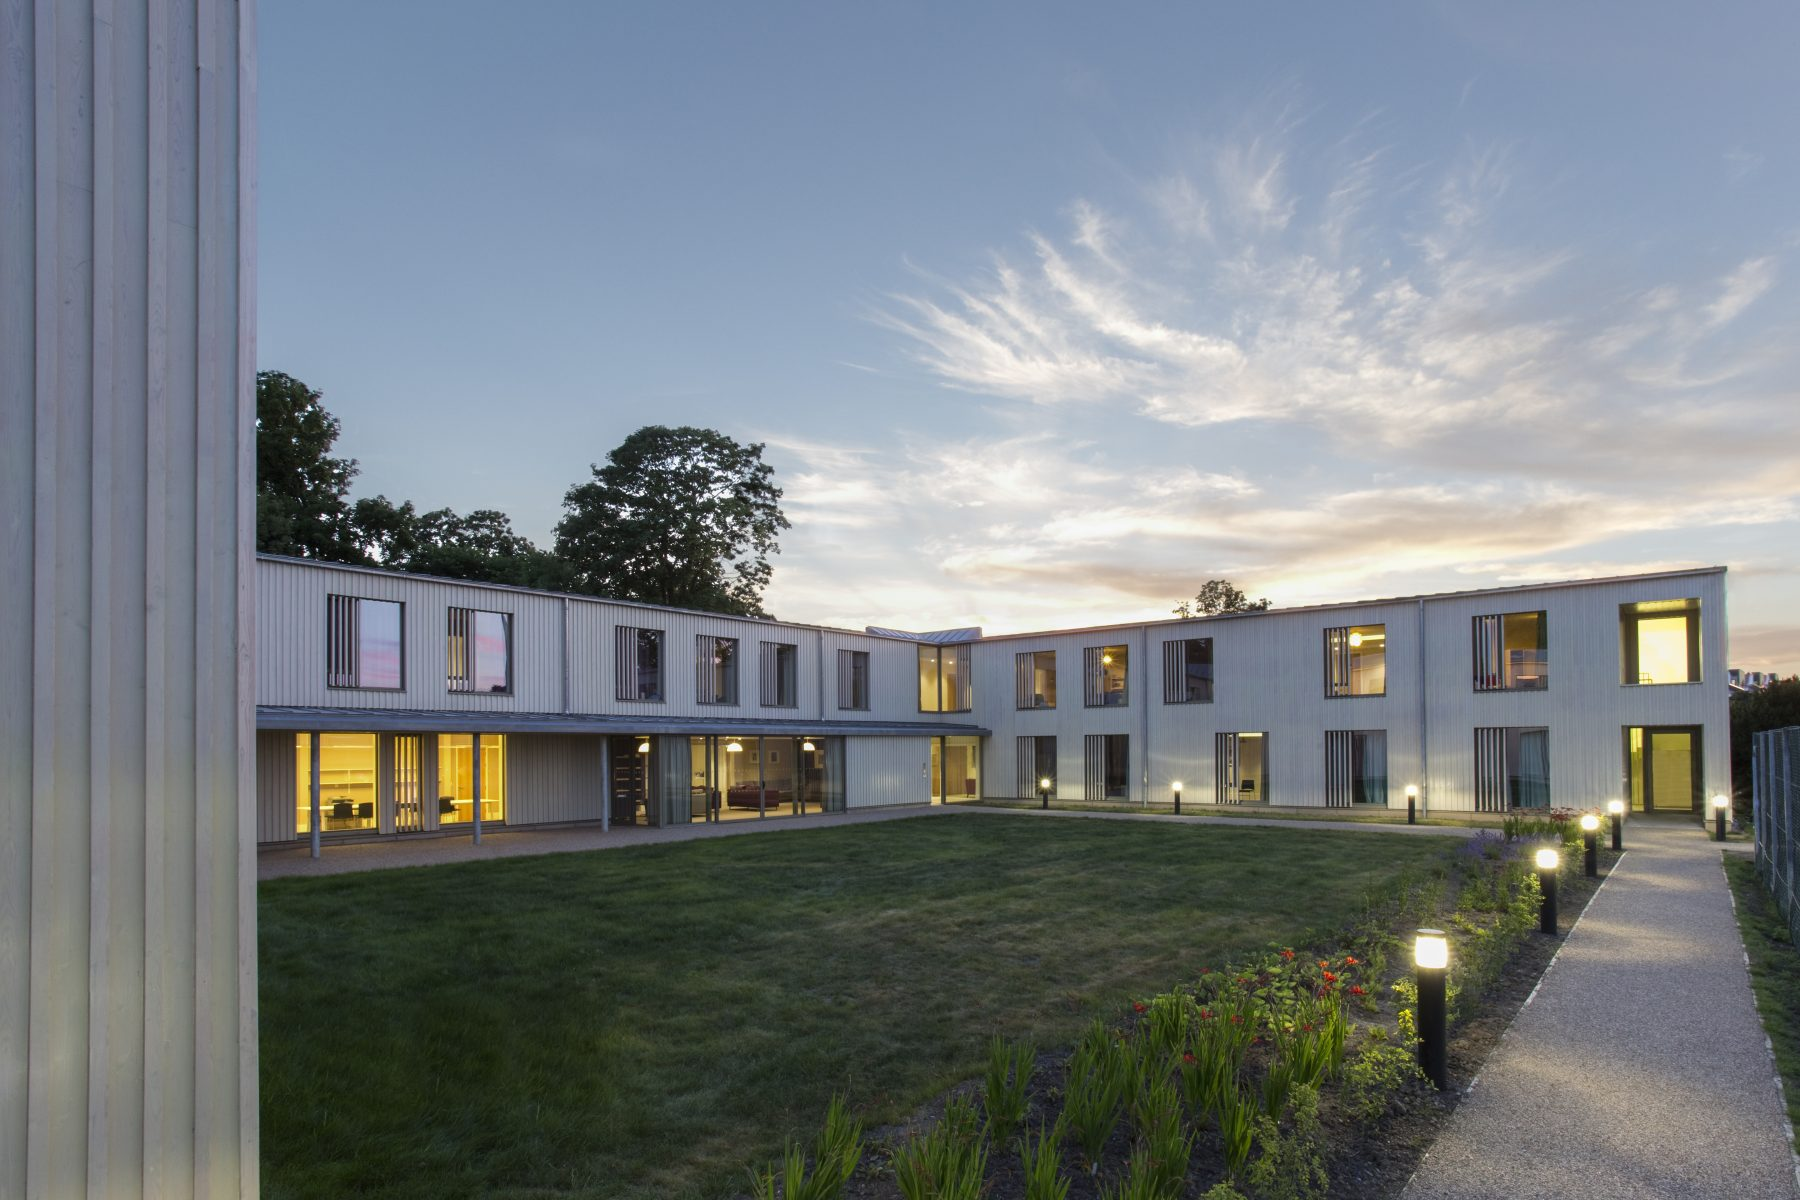 Dalmeny House, Fettes College